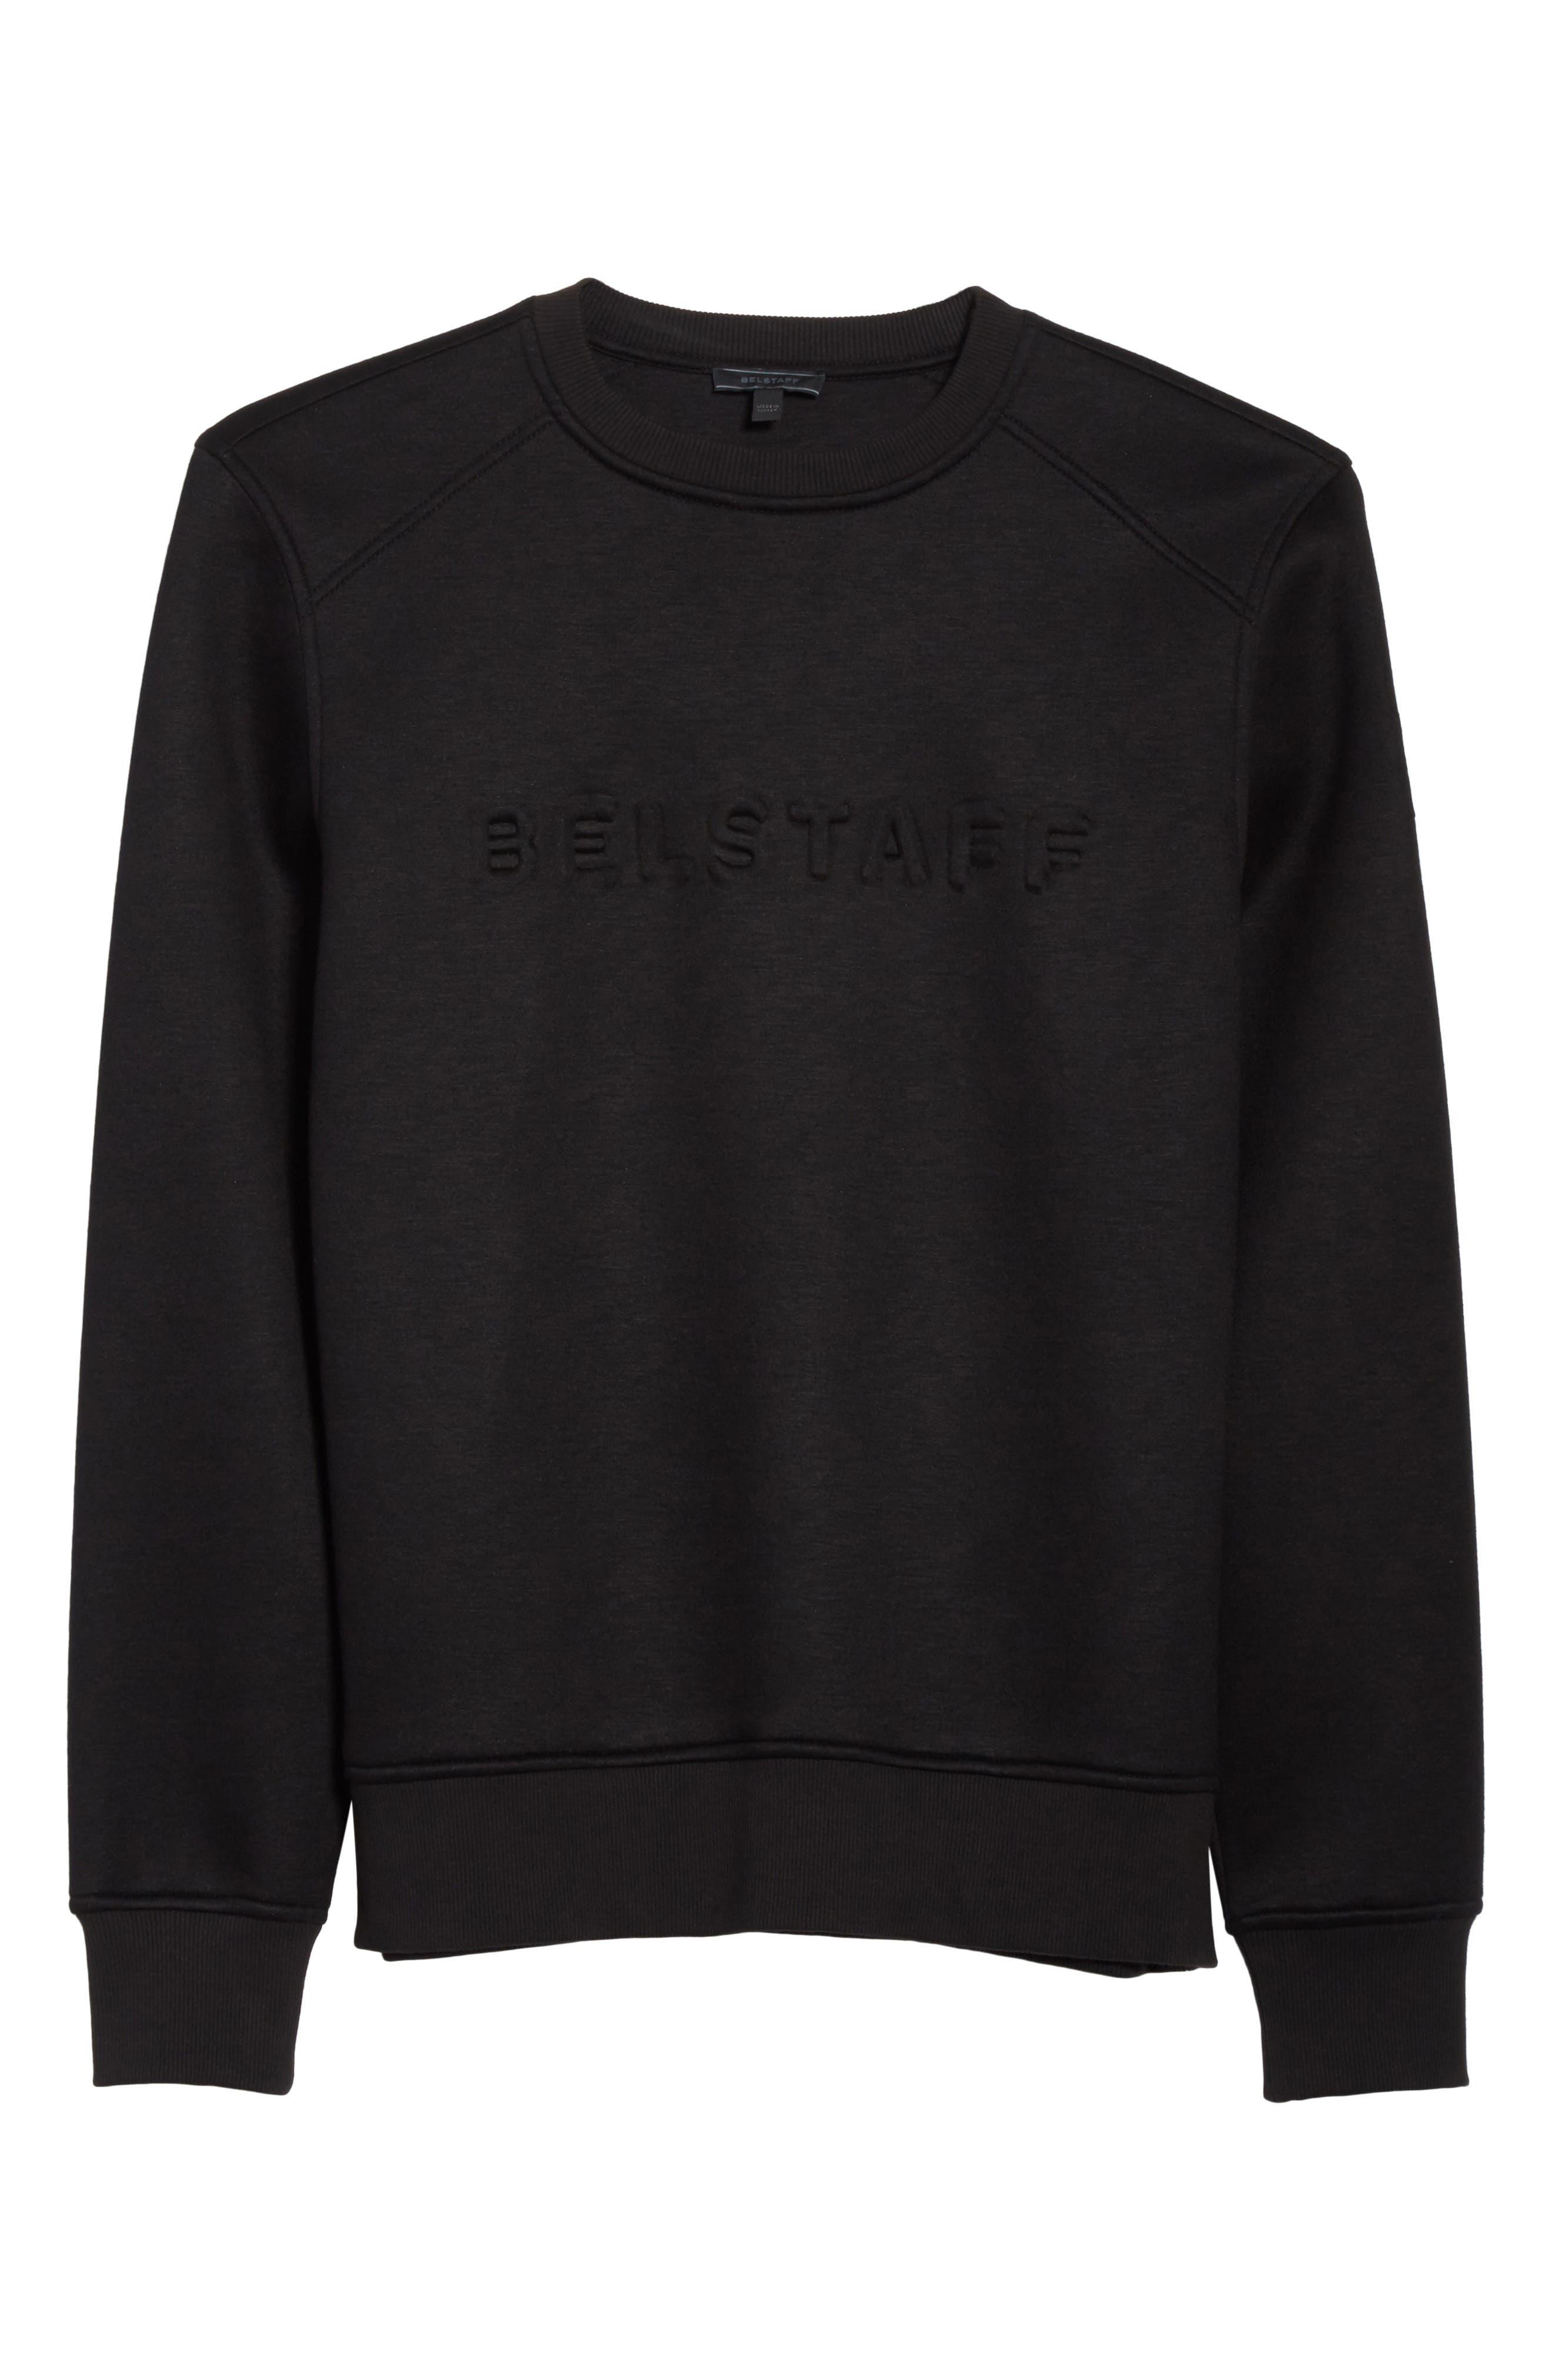 Belsford Crewneck Sweatshirt,                             Alternate thumbnail 6, color,                             Black